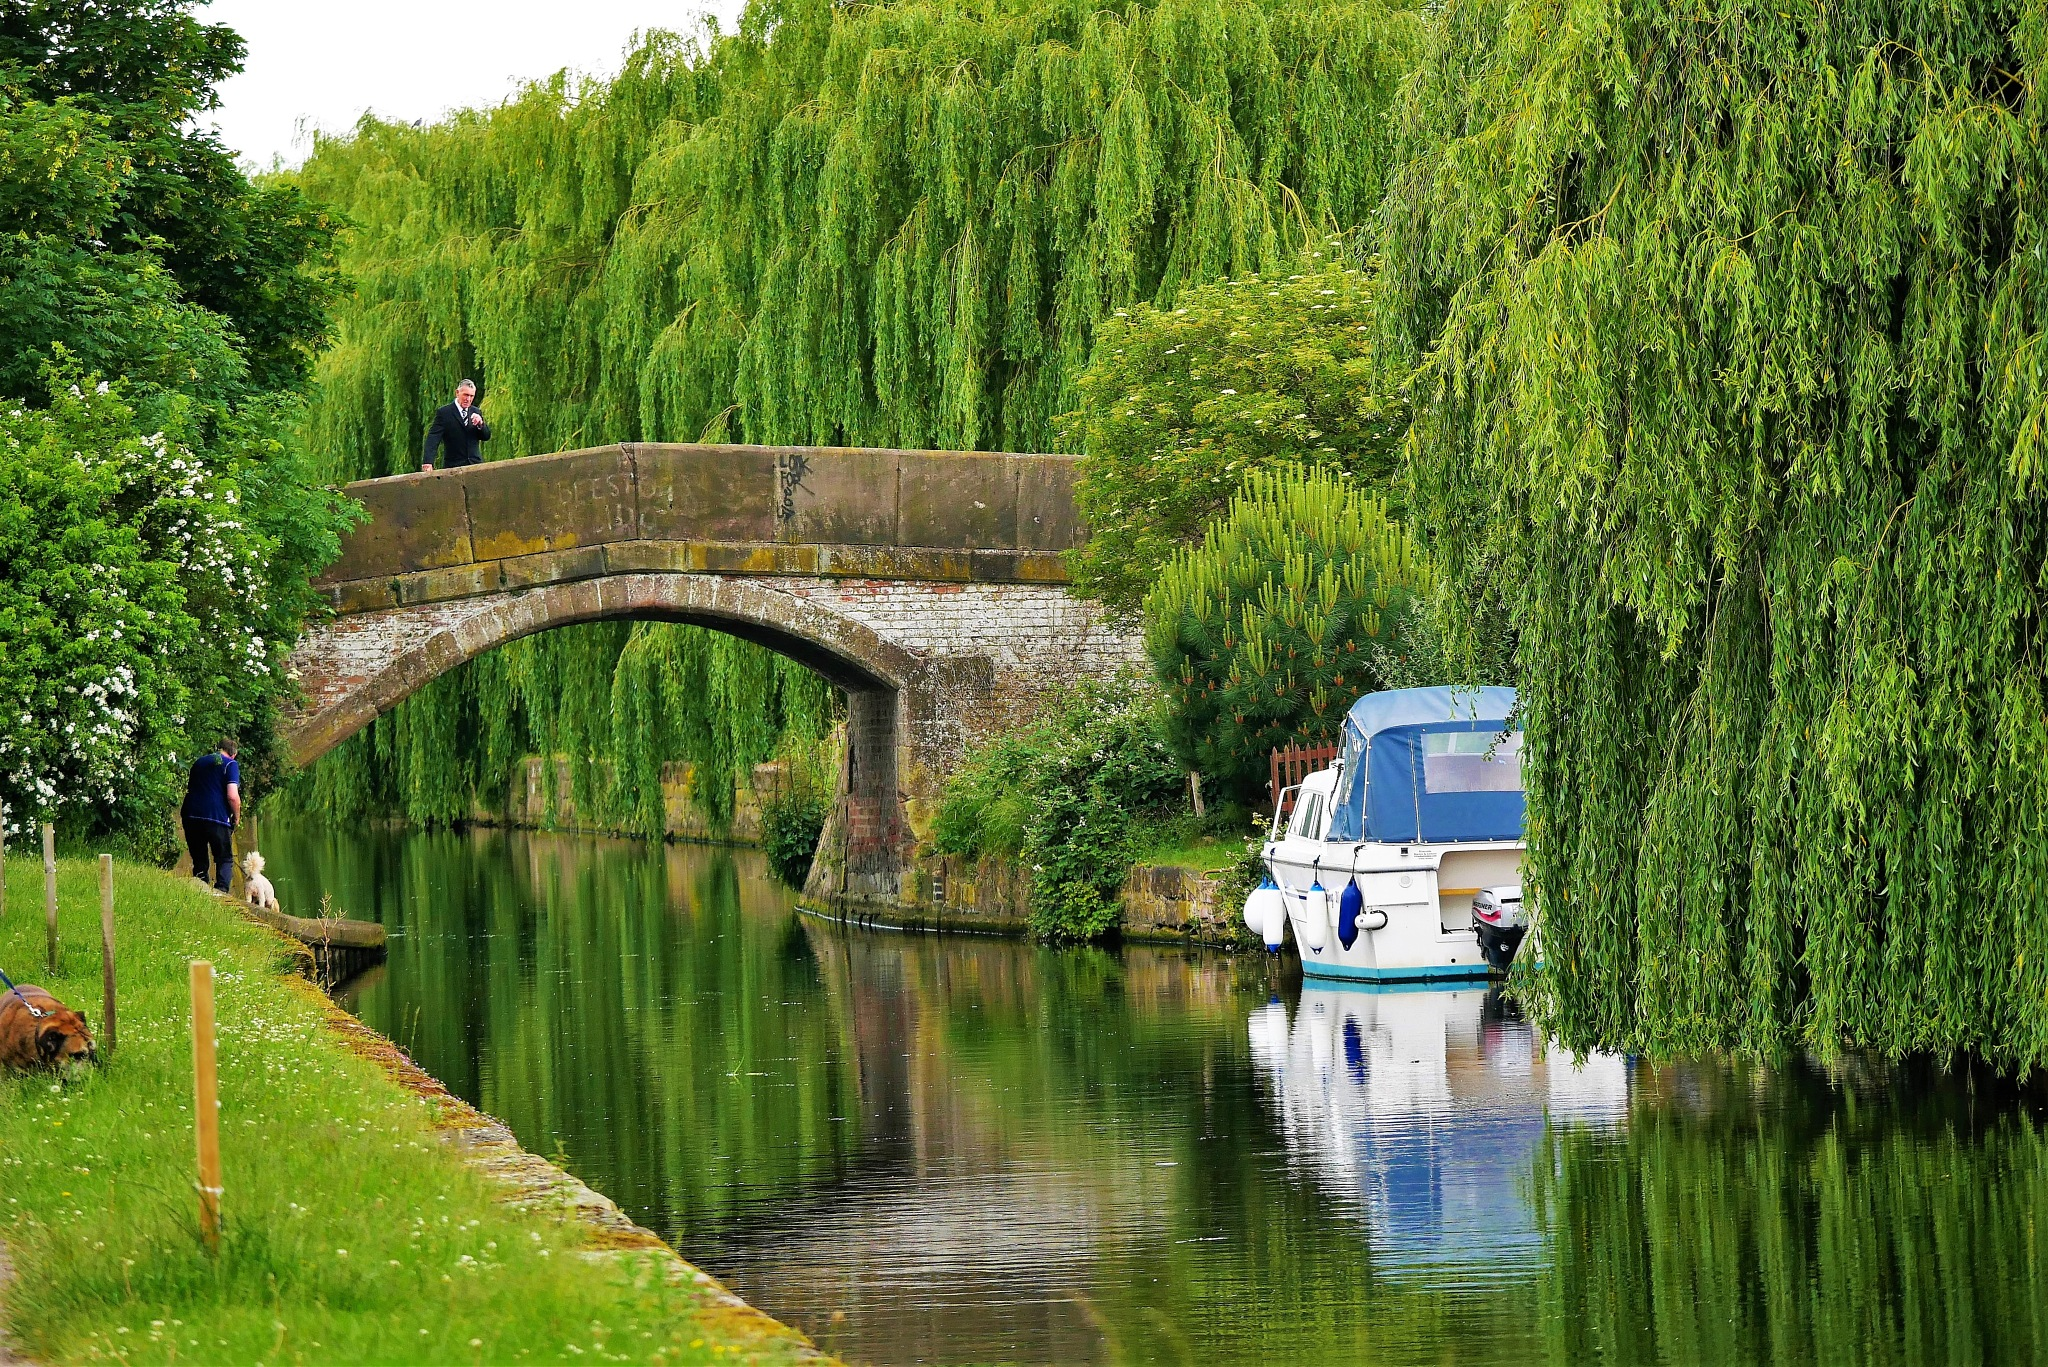 Green canal by AJ Yakstrangler Andy Jamieson